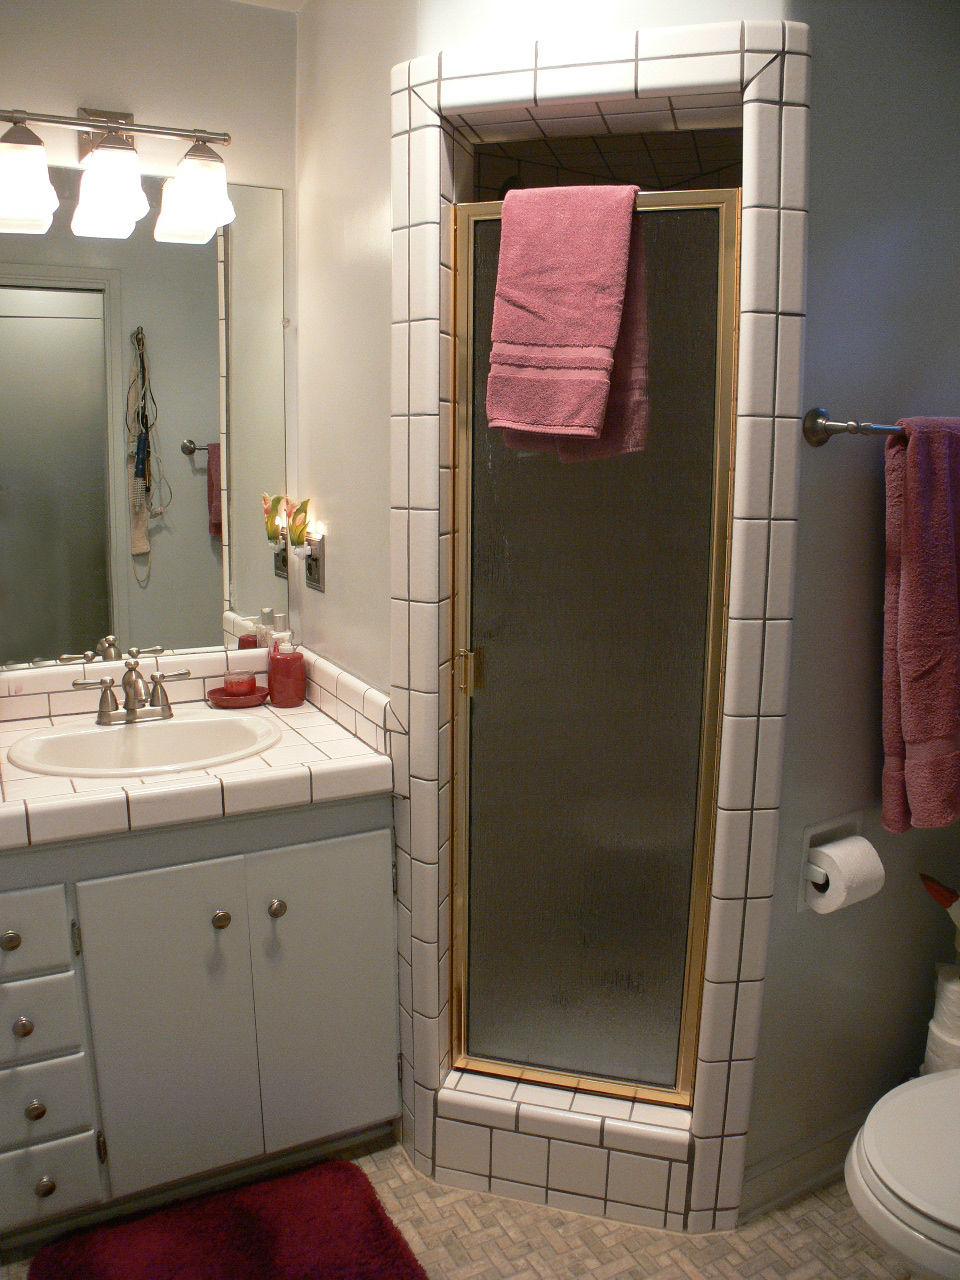 Fancy Downstairs three quarter bathroom off the kitchen